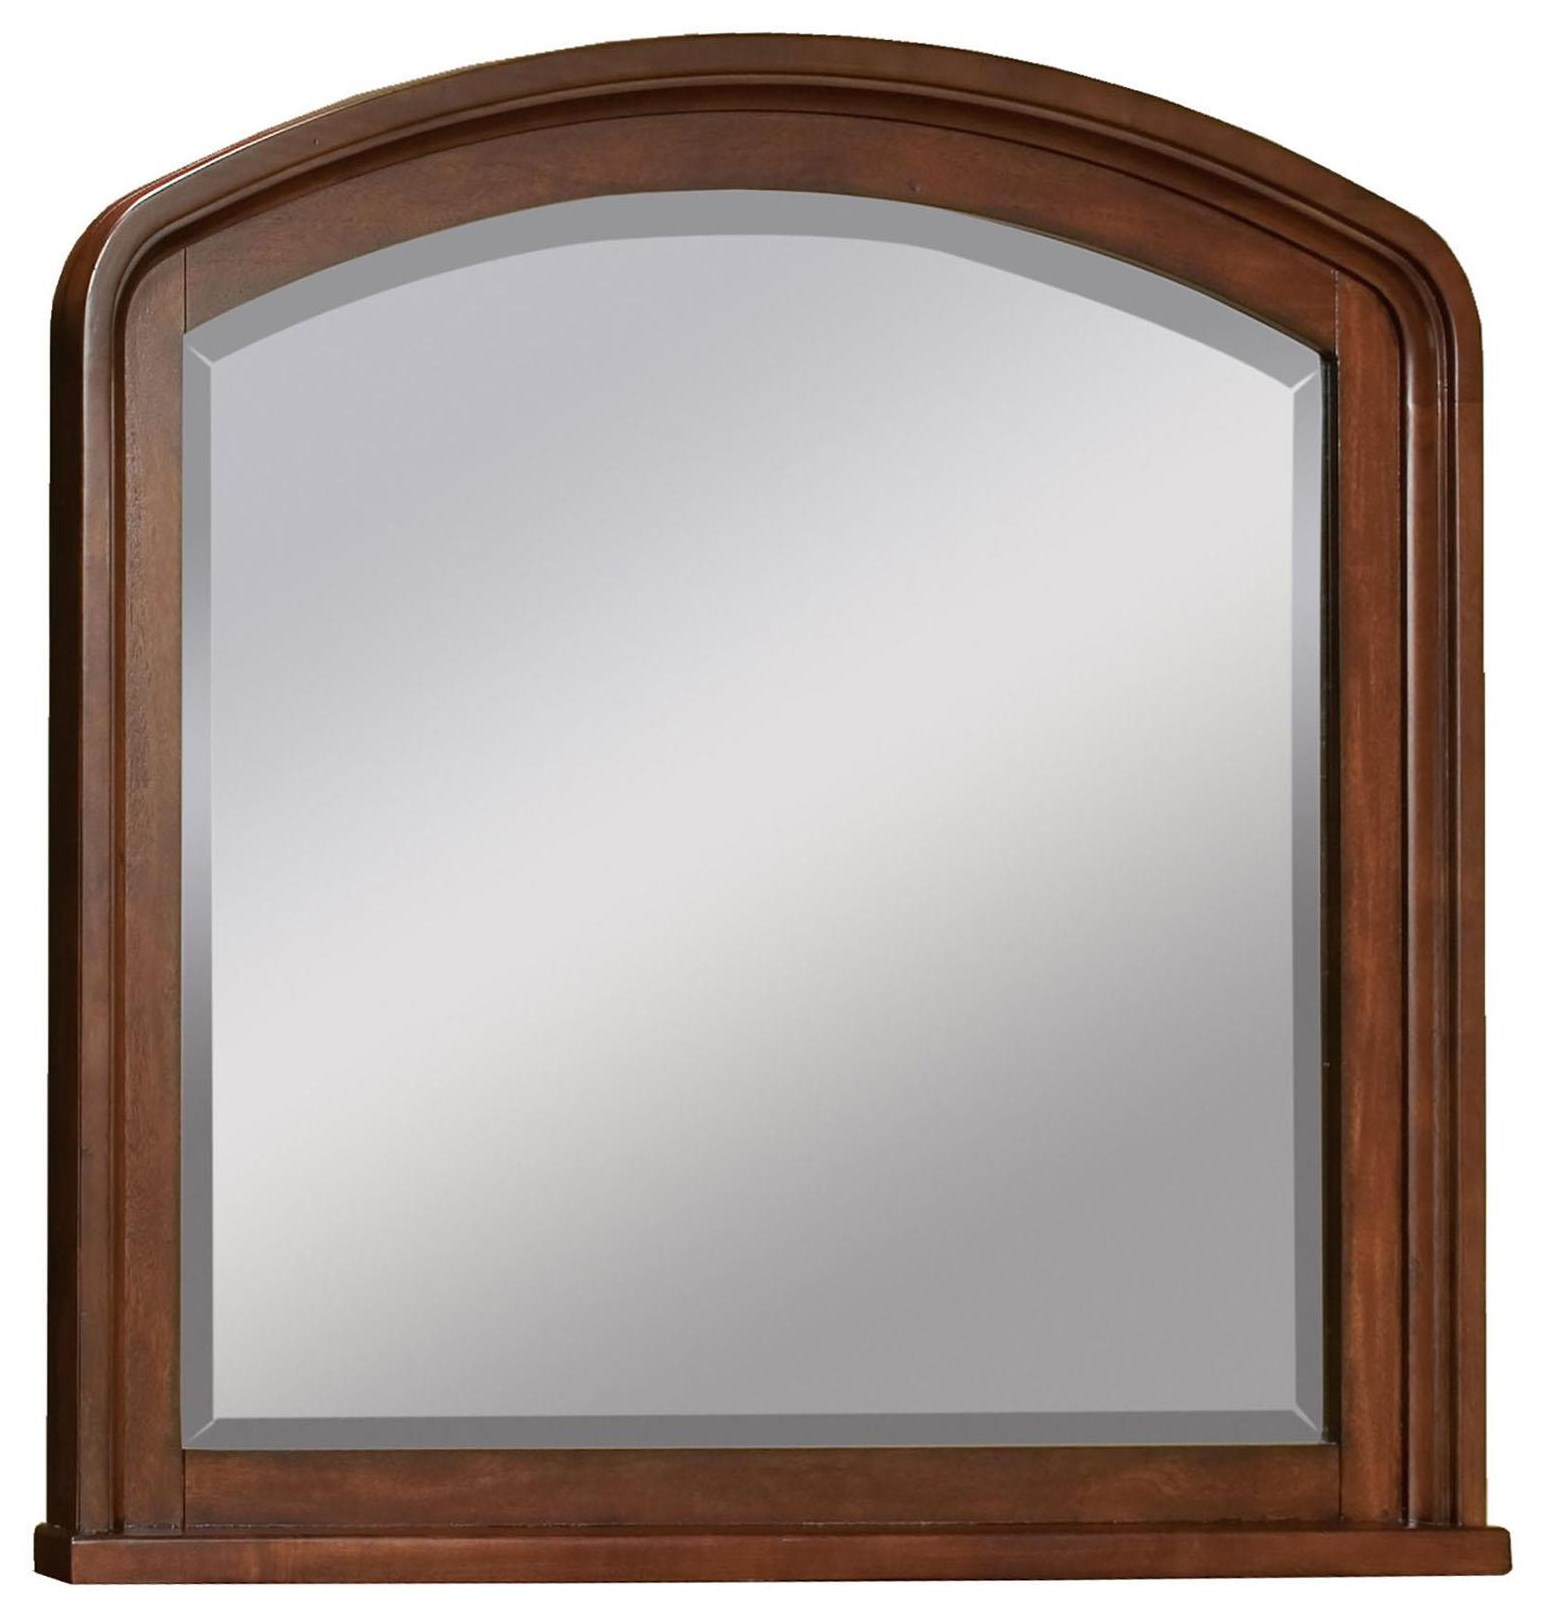 Double Dresser Mirror at Sadler's Home Furnishings